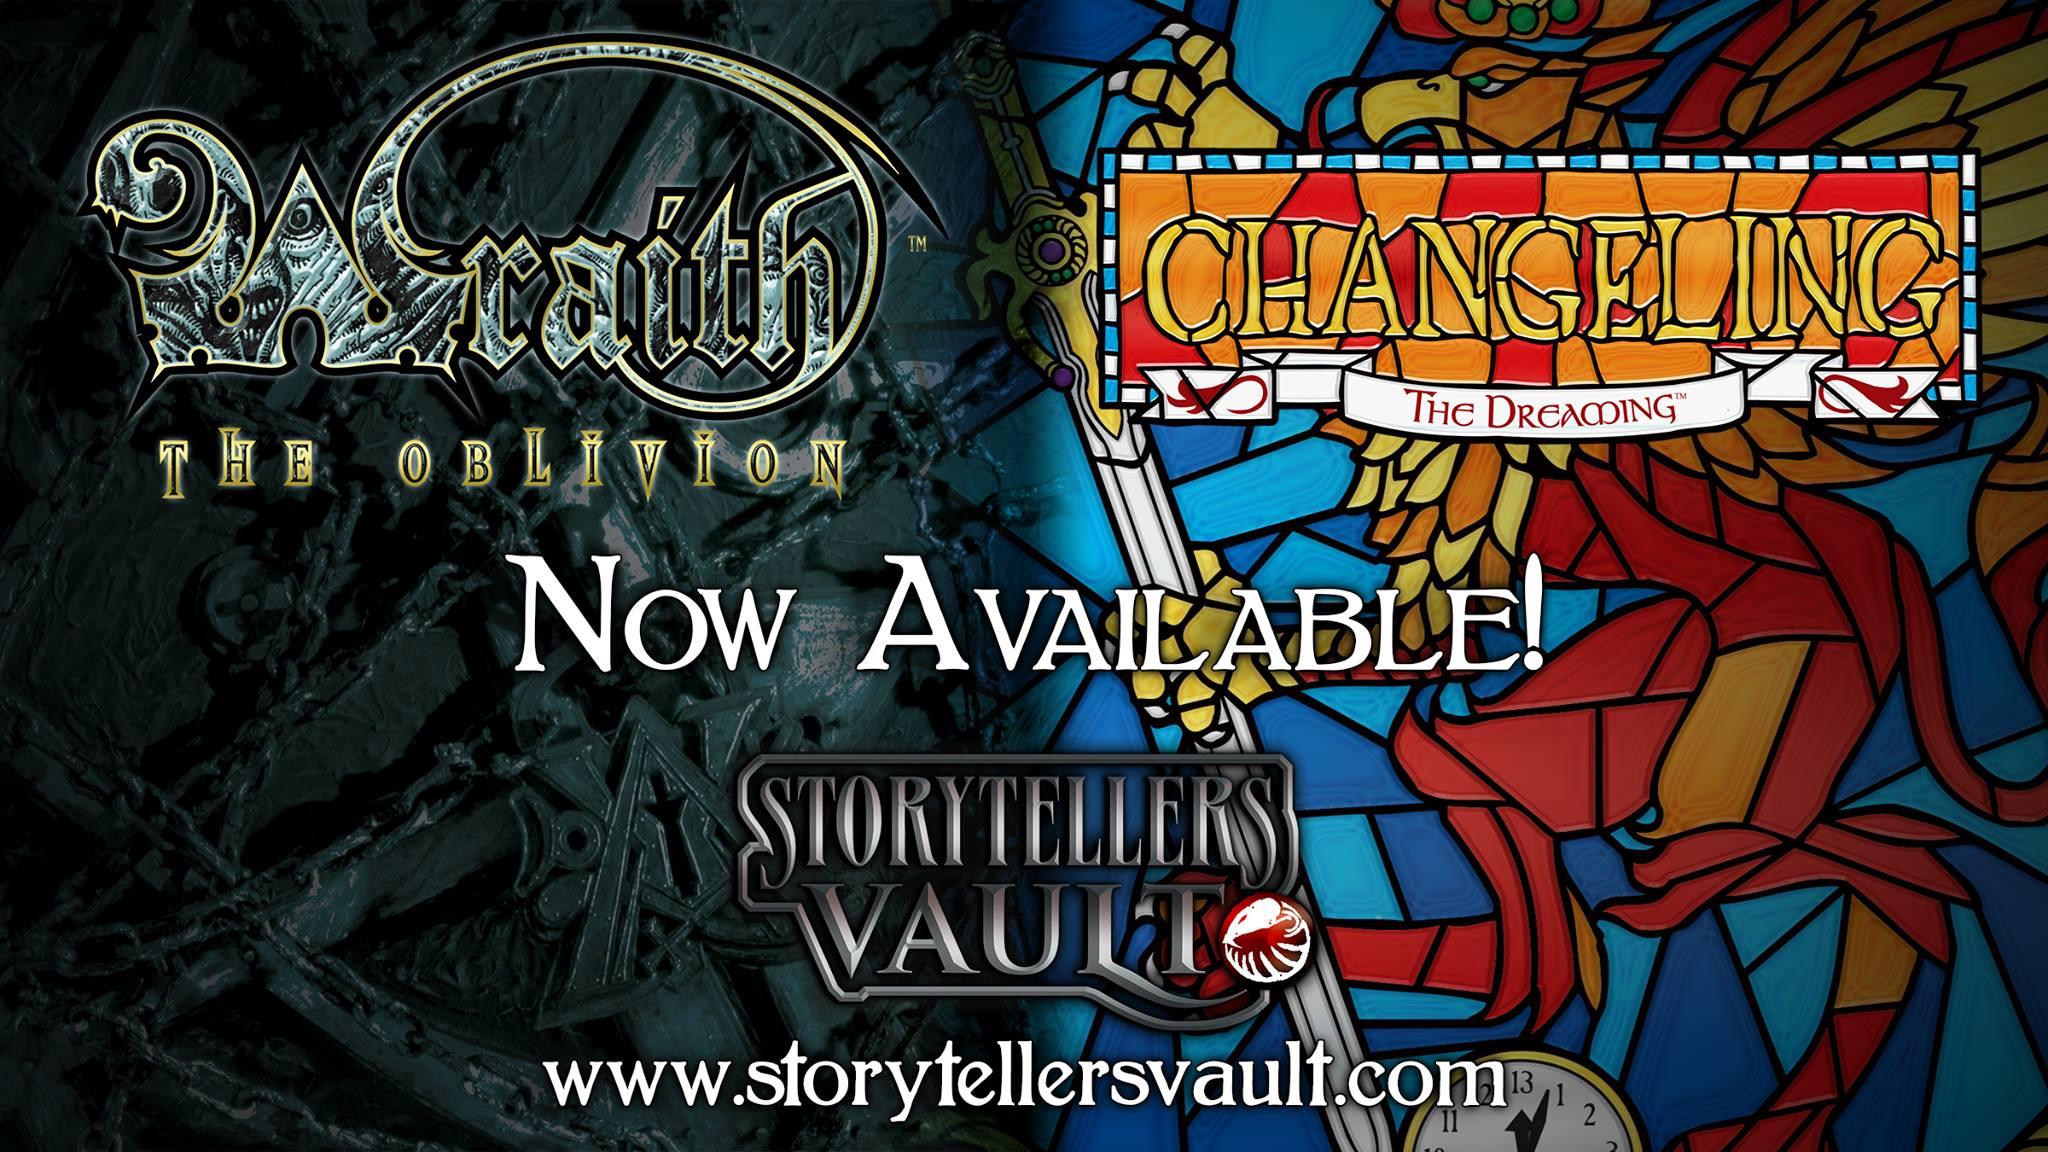 Storytellers Vault - Wraith The Oblivion, Changeling The Dreaming - Banner - Freischaltung